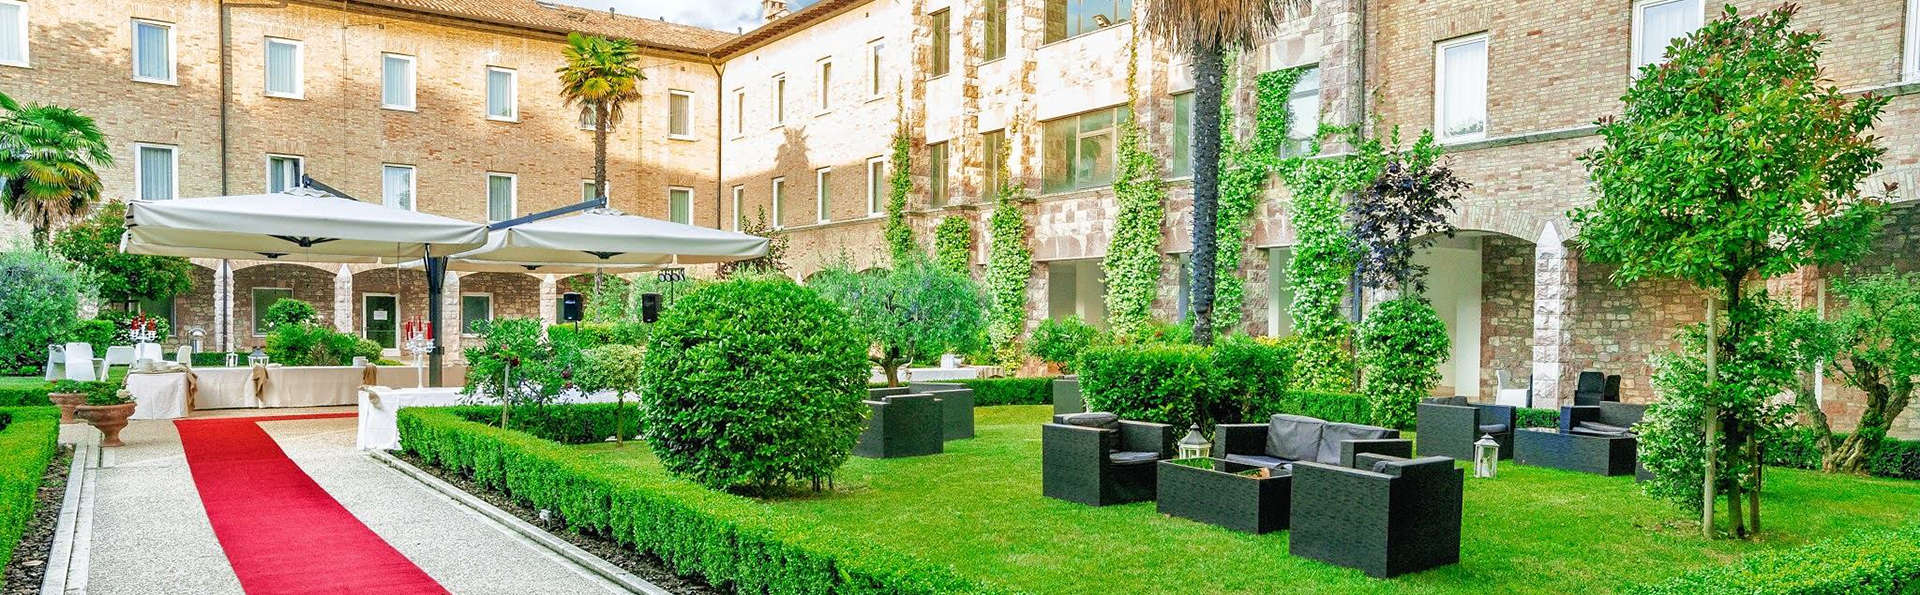 Hotel Cenacolo - Edit_Front.jpg